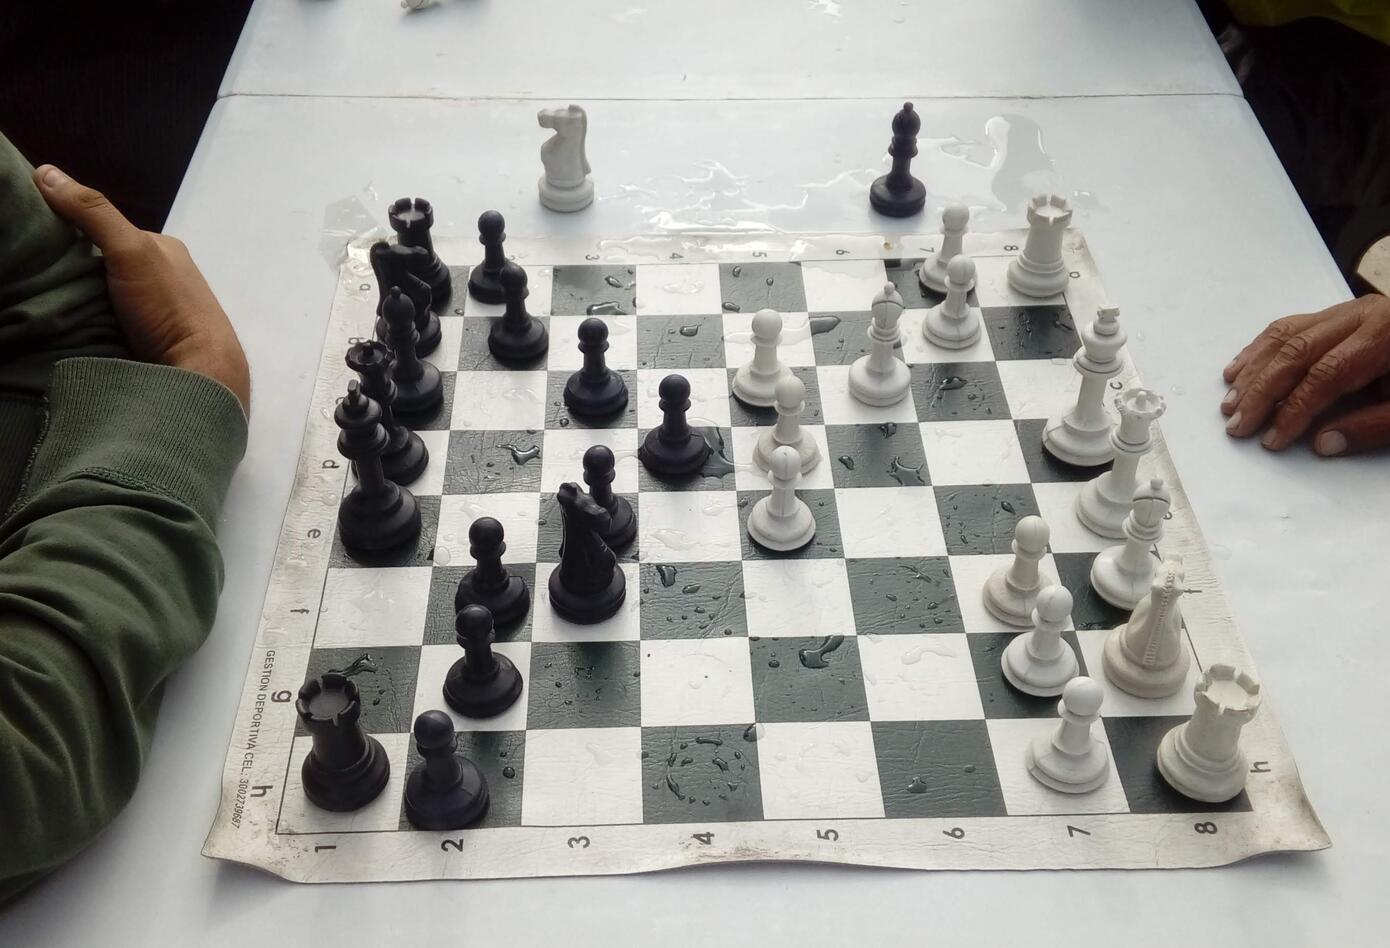 Las fichas de ajedrez cautivan a los amantes de este deporte,